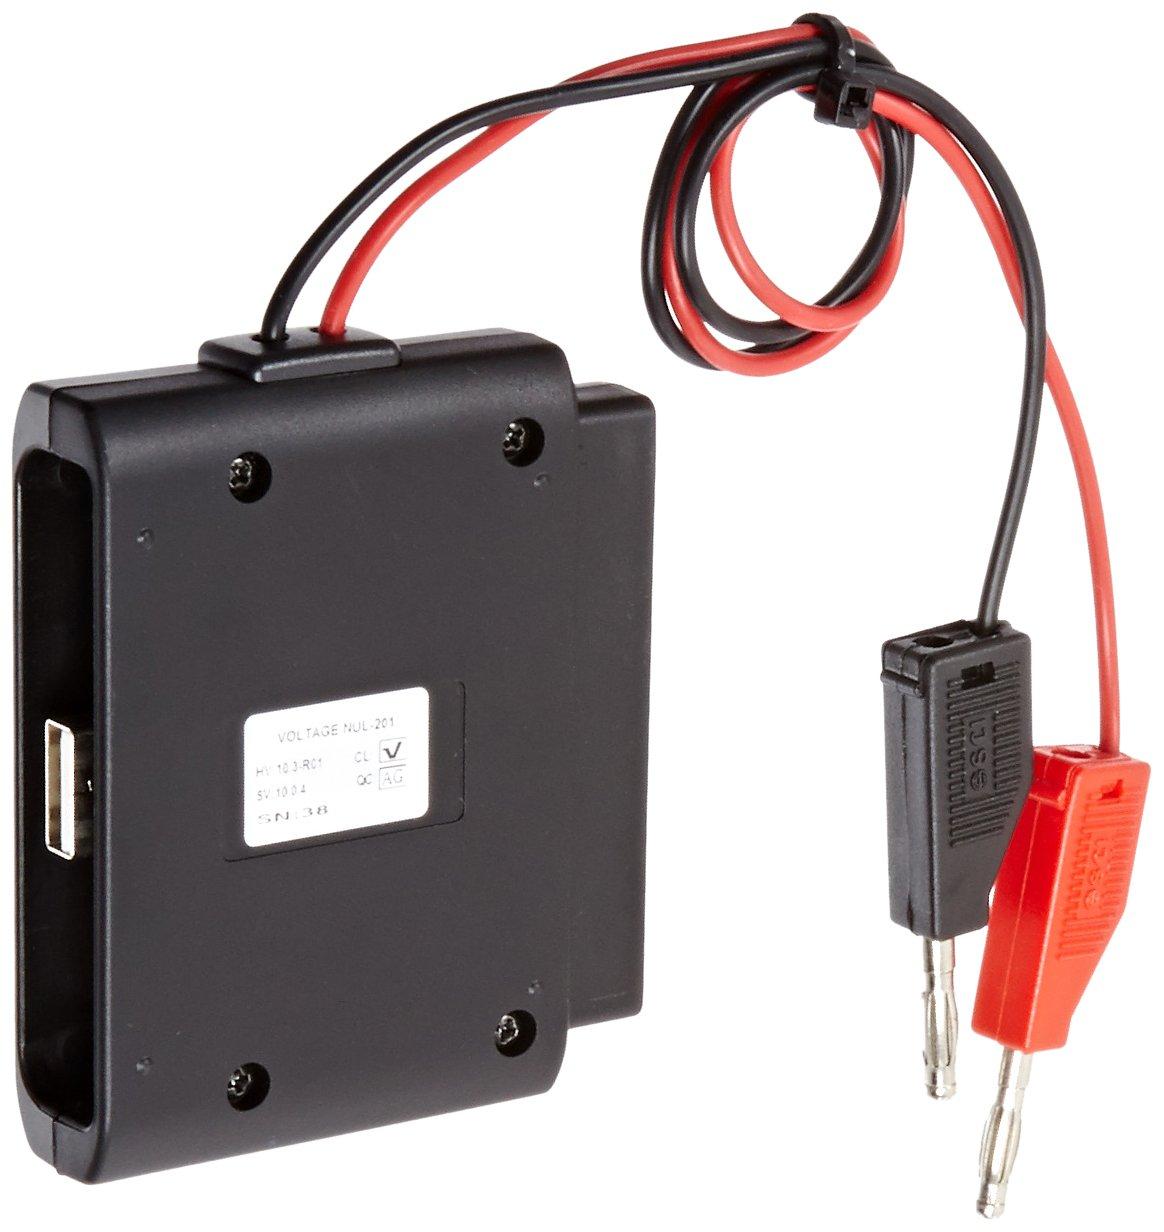 NEULOG NUL201 Voltage Logger Sensor 1 Percent Accuracy EISCO 15 bit ADC Resolution